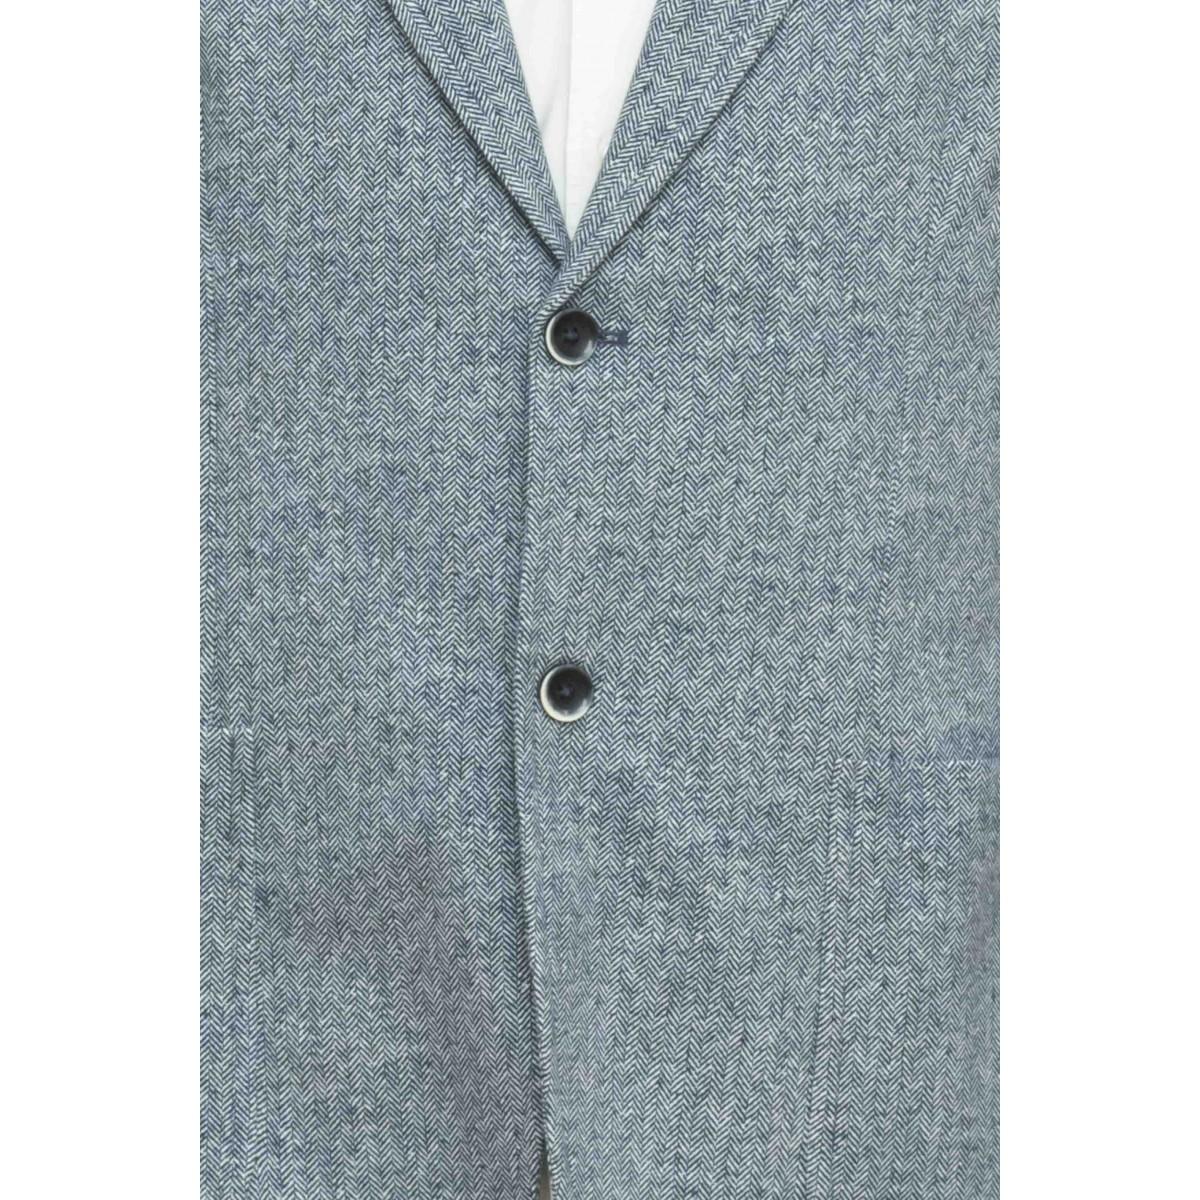 Giacca uomo - Cn2238 giacca jersey special print spigato